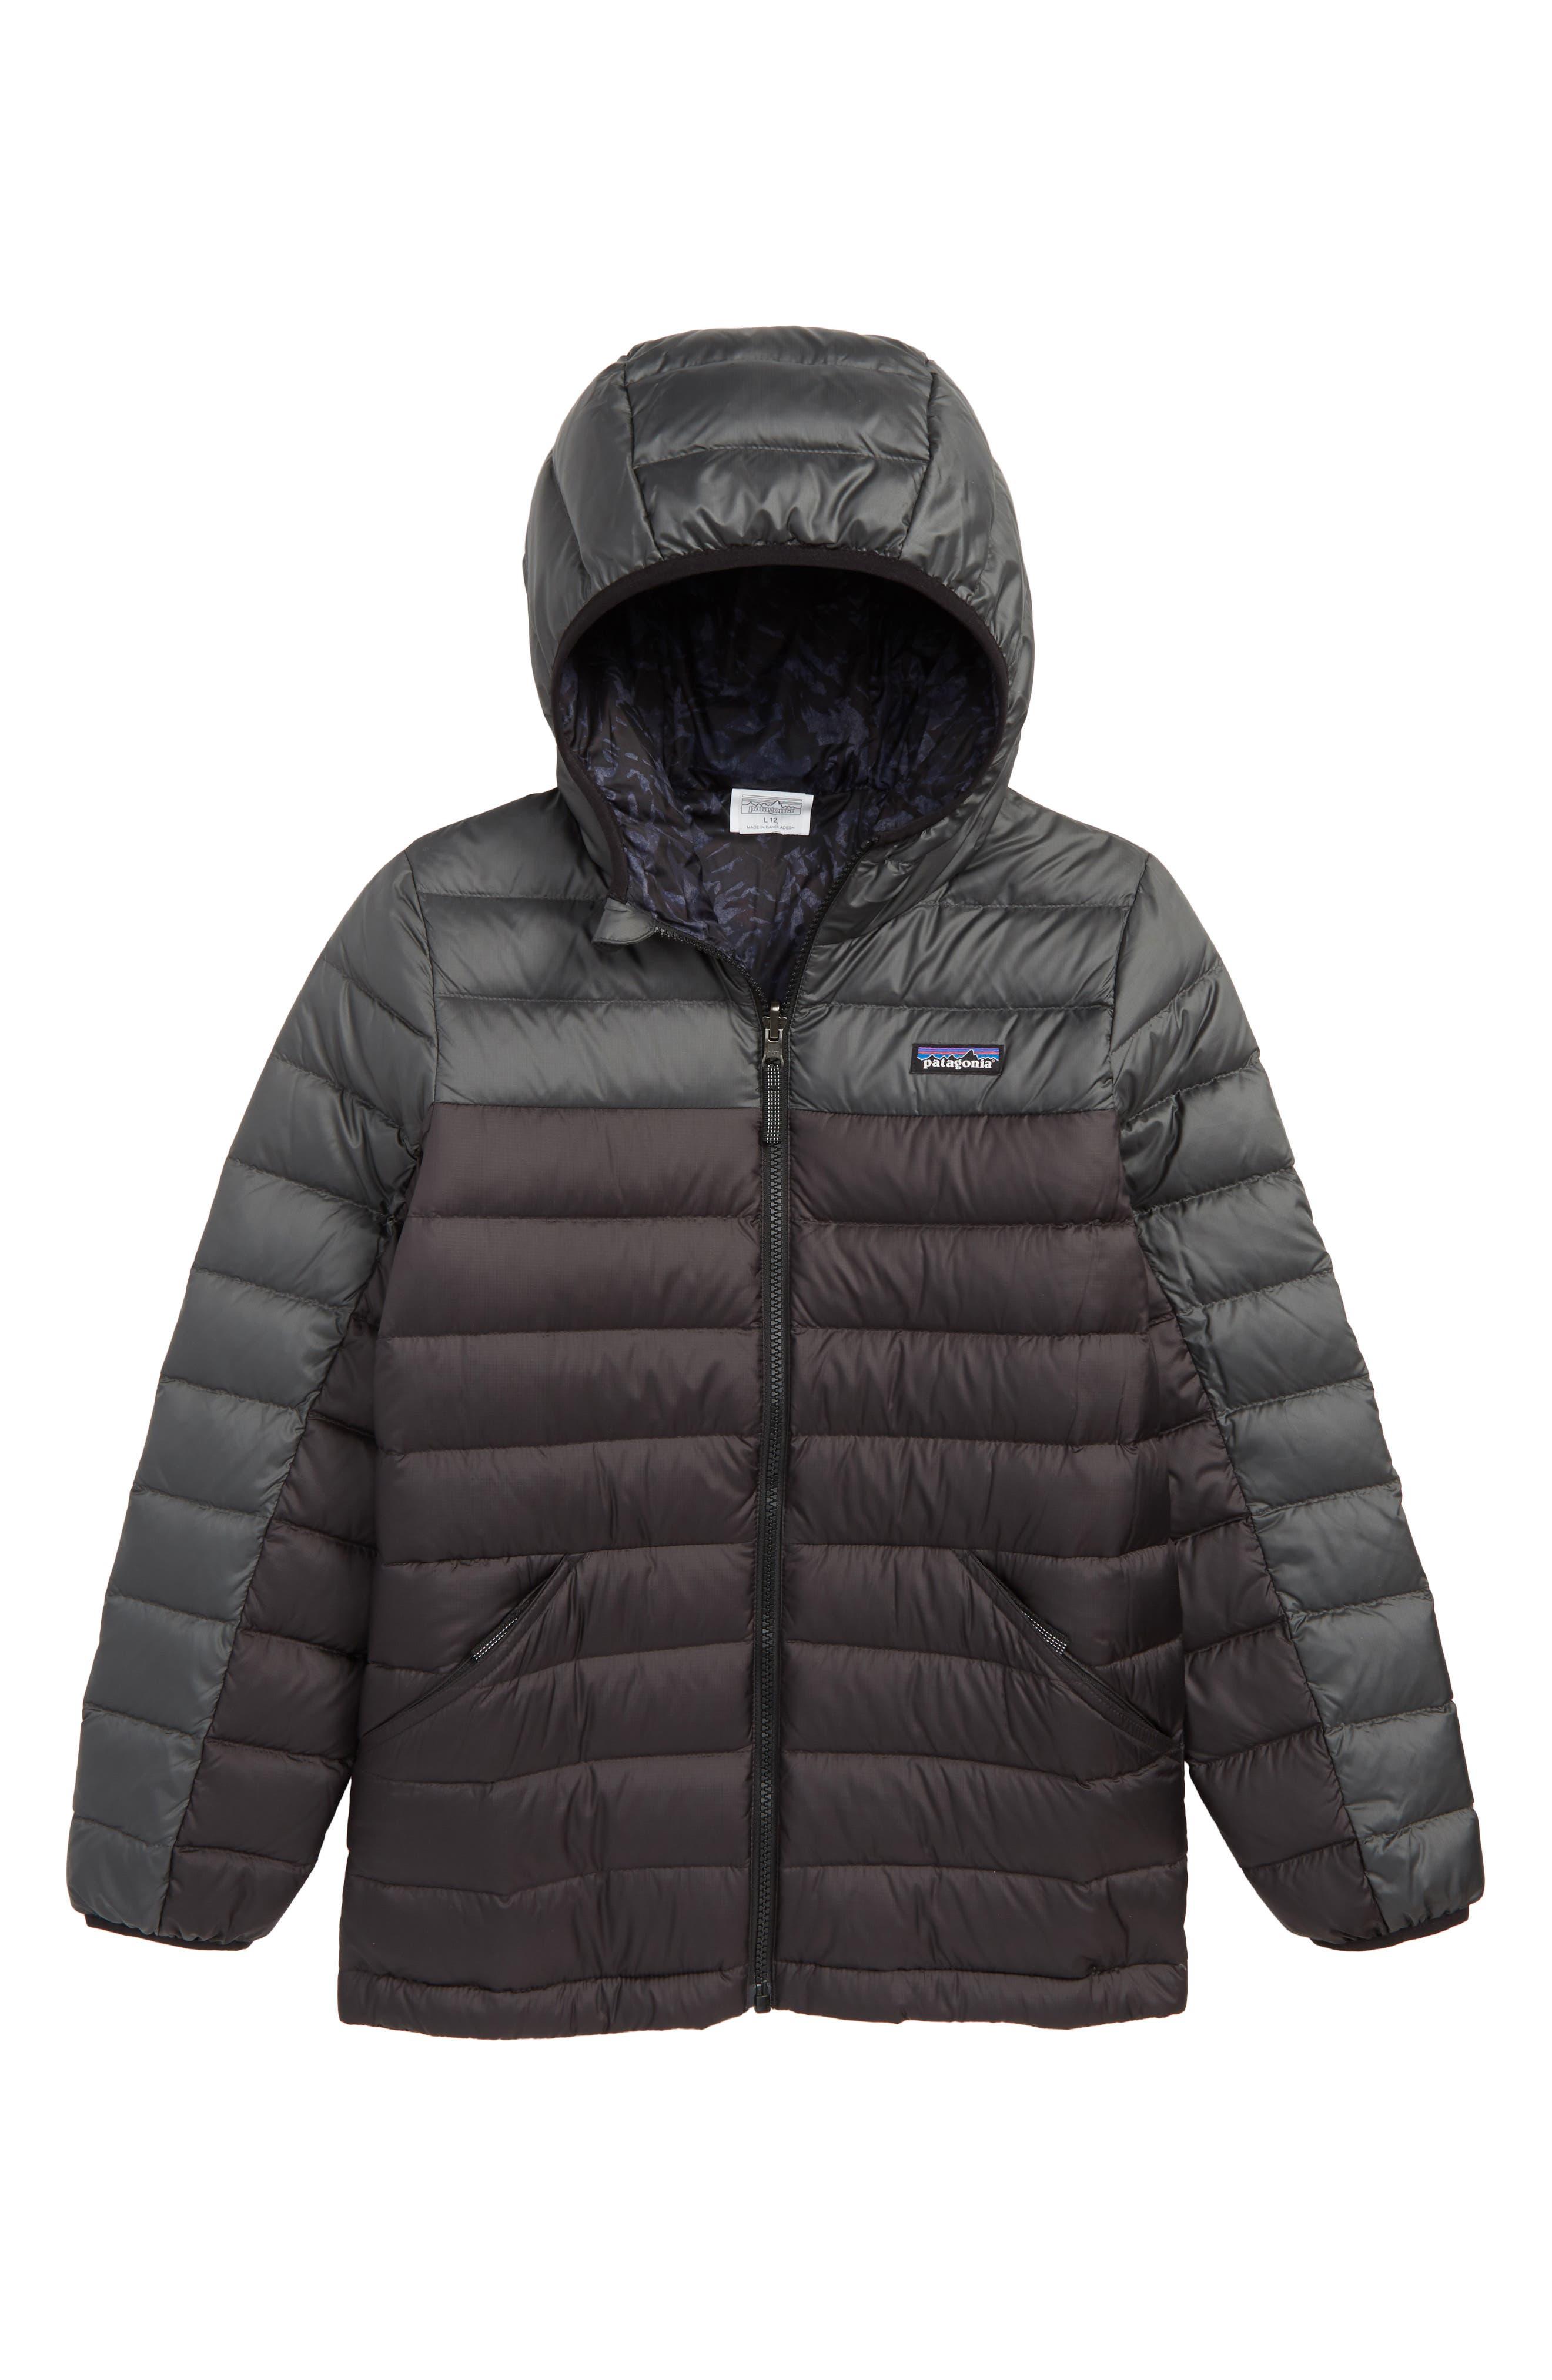 PATAGONIA, Water Repellent Reversible Down Sweater Hoodie, Main thumbnail 1, color, 001